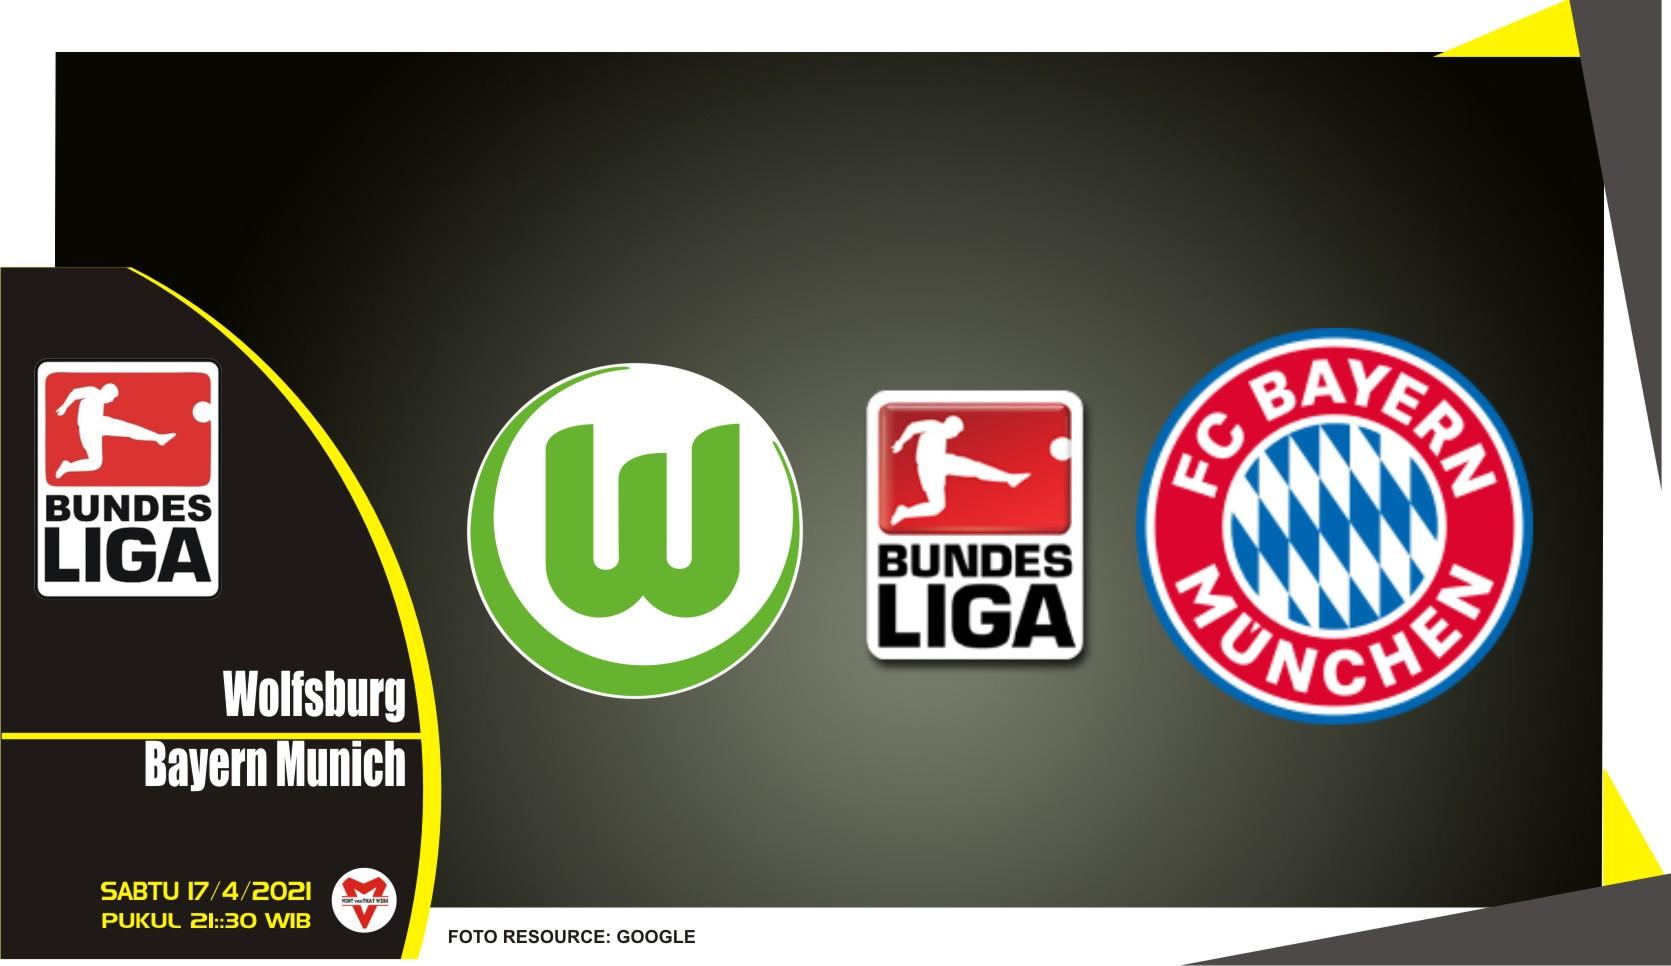 Prediksi Liga Jerman: Wolfsburg vs Bayern Munich - 17 April 2021